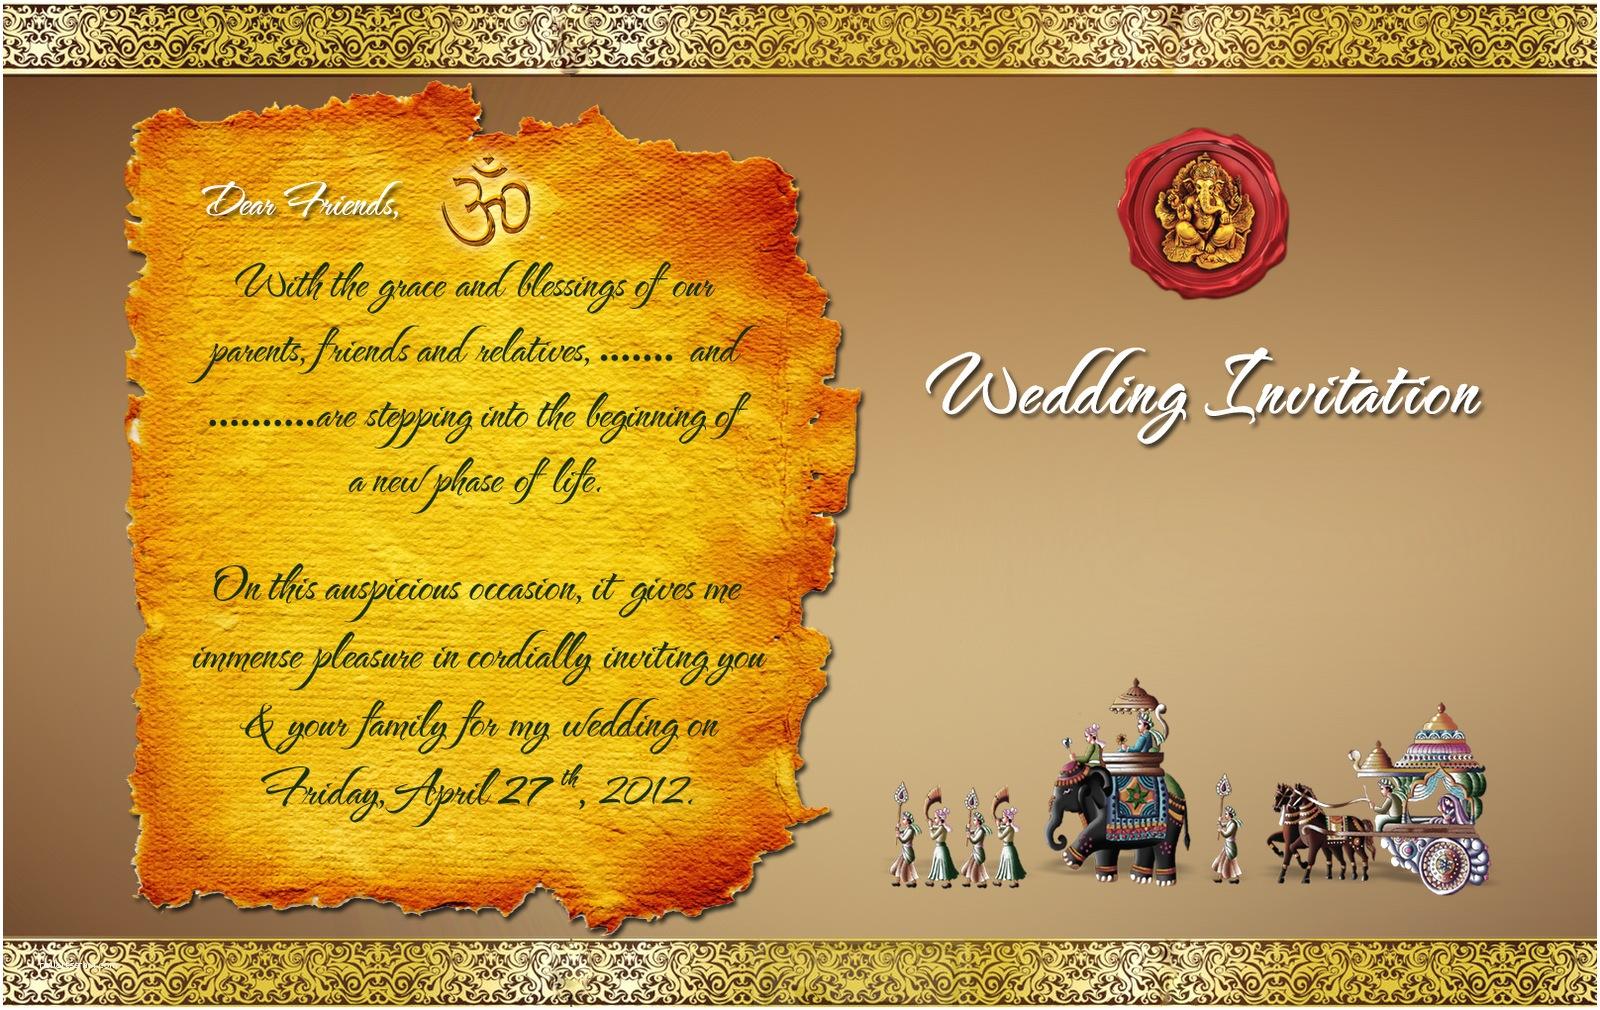 Indian Wedding Invitation Designs Free Download Indian Wedding Card Design Psd Files Free Wedding